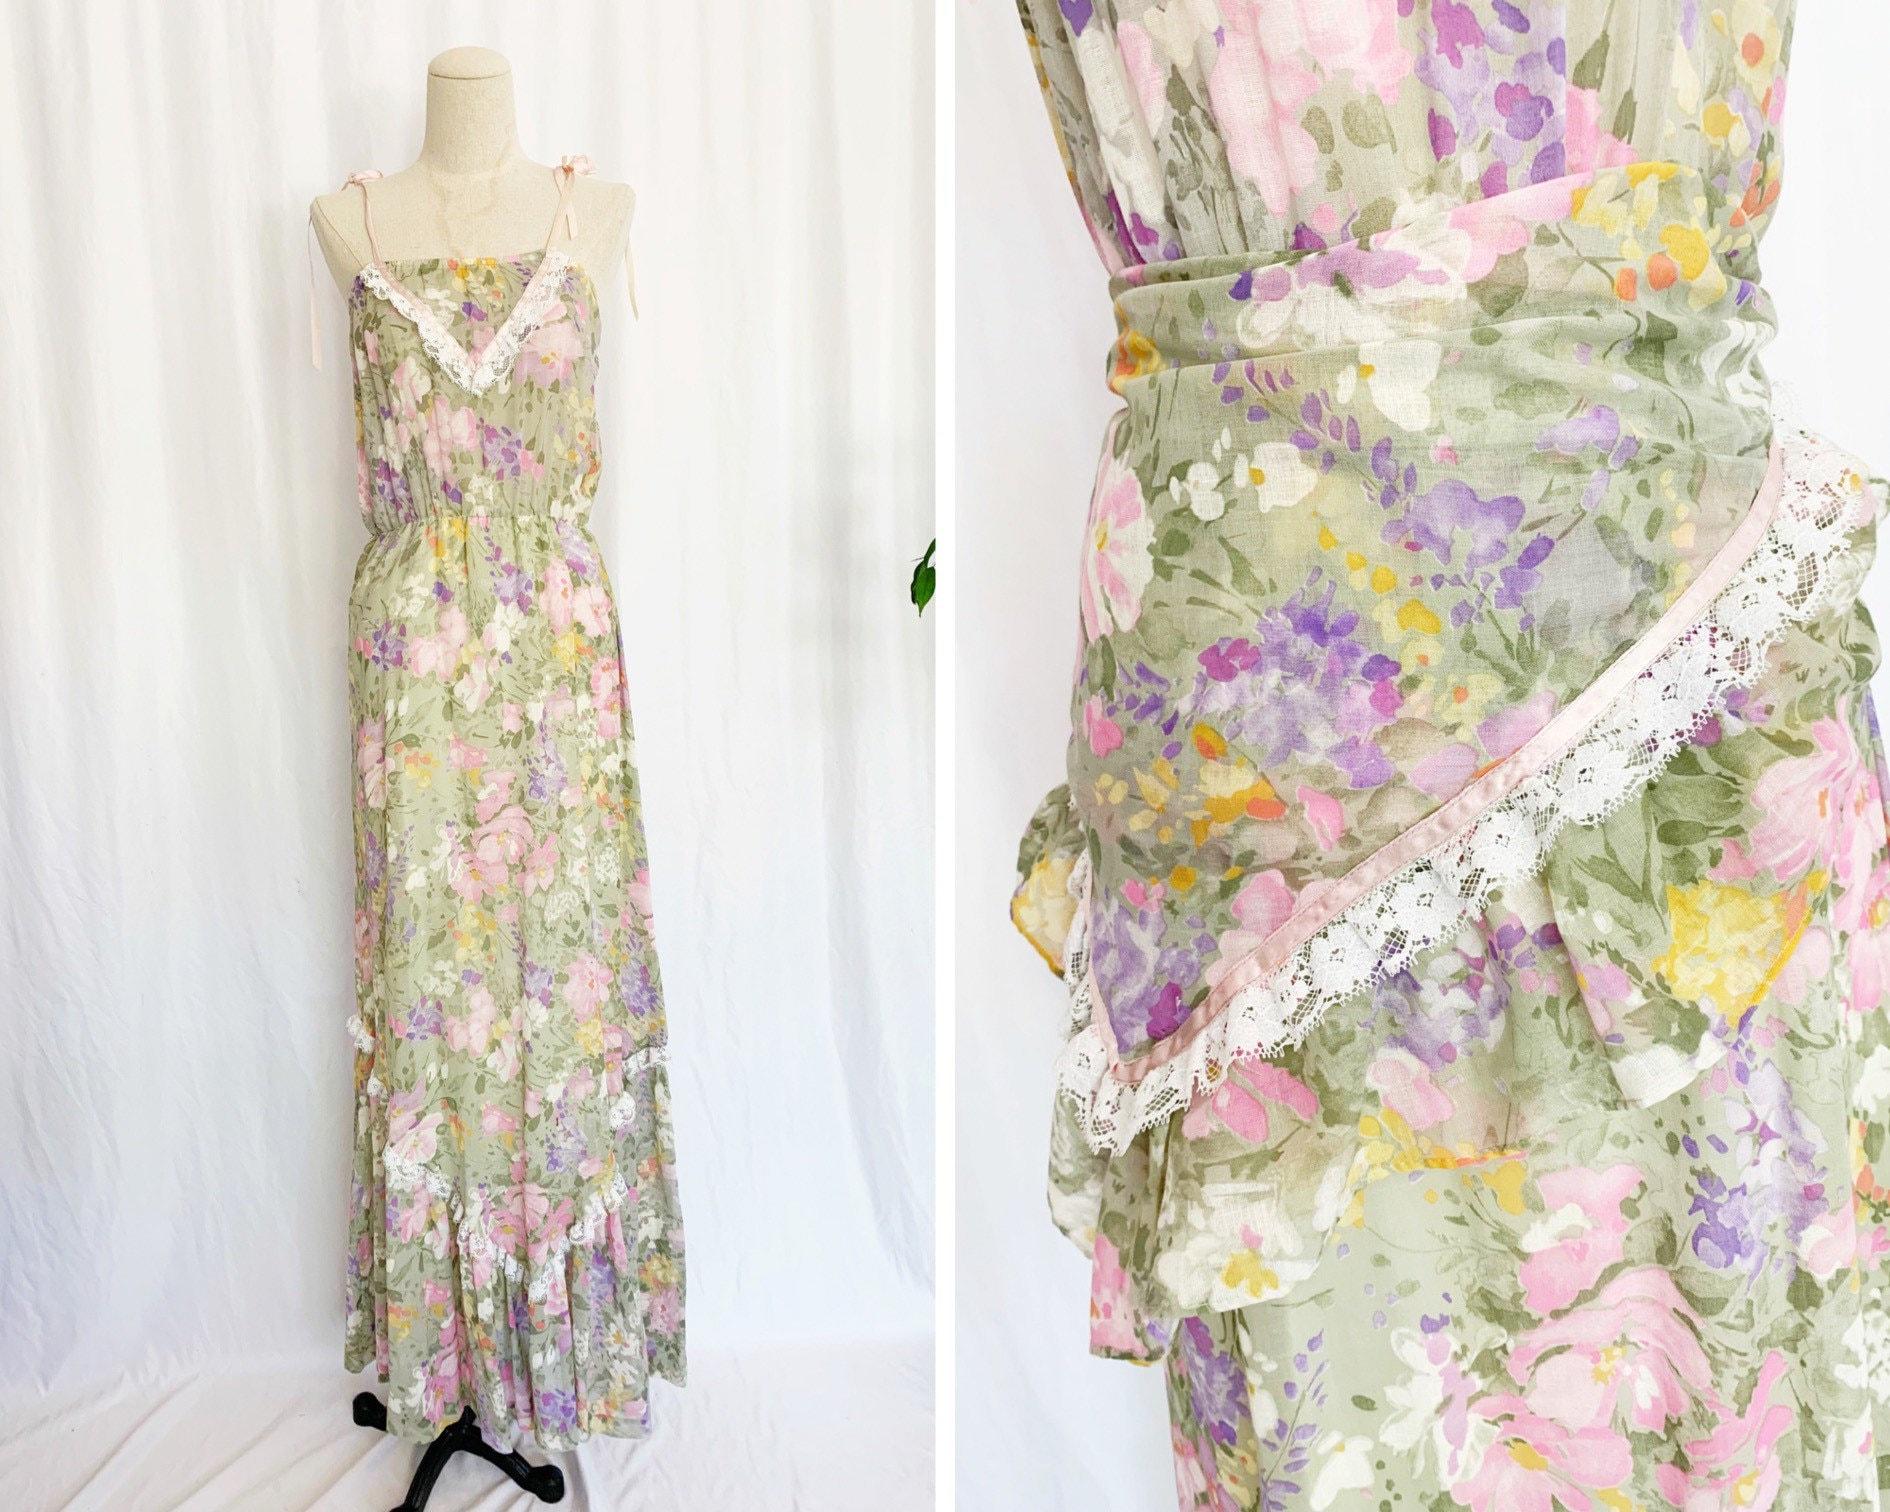 Vintage Scarf Styles -1920s to 1960s 1970s XsS Floral Prairie Dress  Scarf $30.00 AT vintagedancer.com